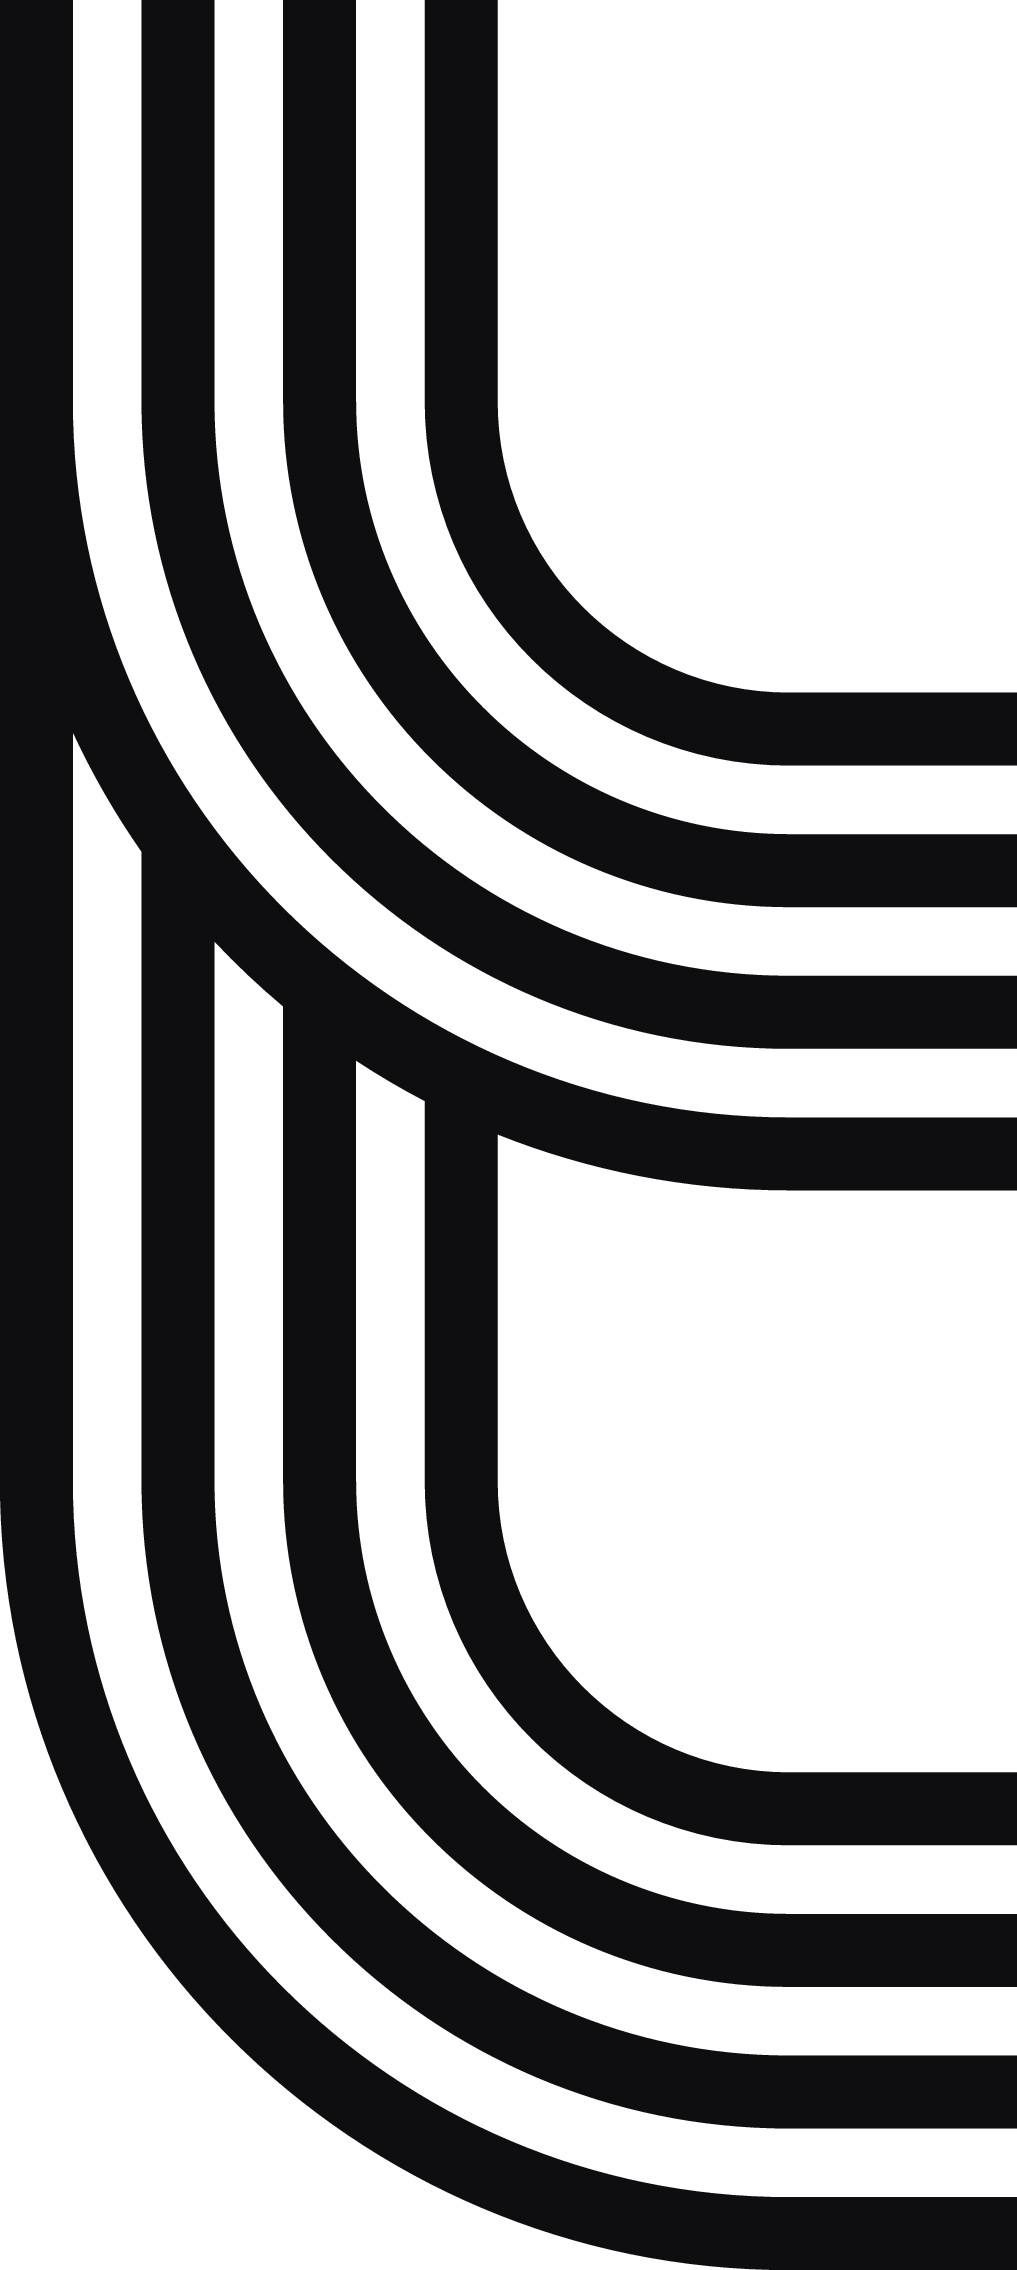 Innovative digital publisher needs new logo